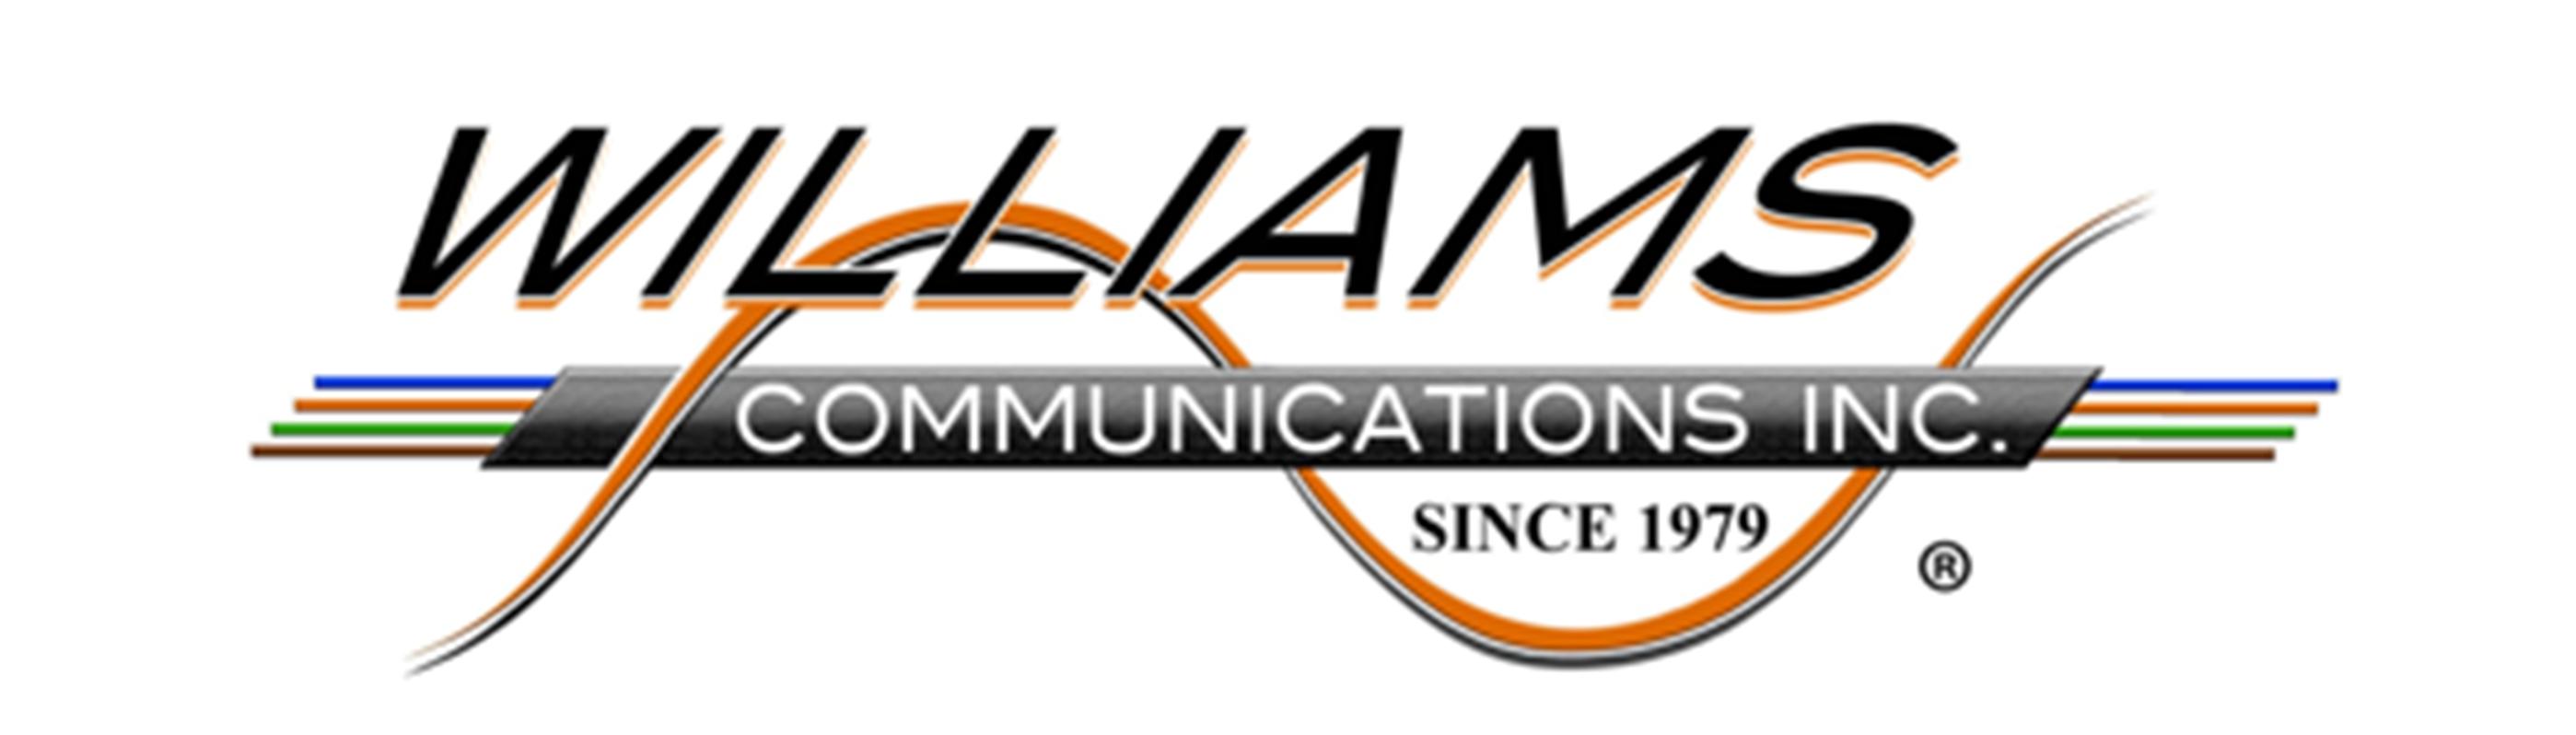 Williams Communication (logo)_v3